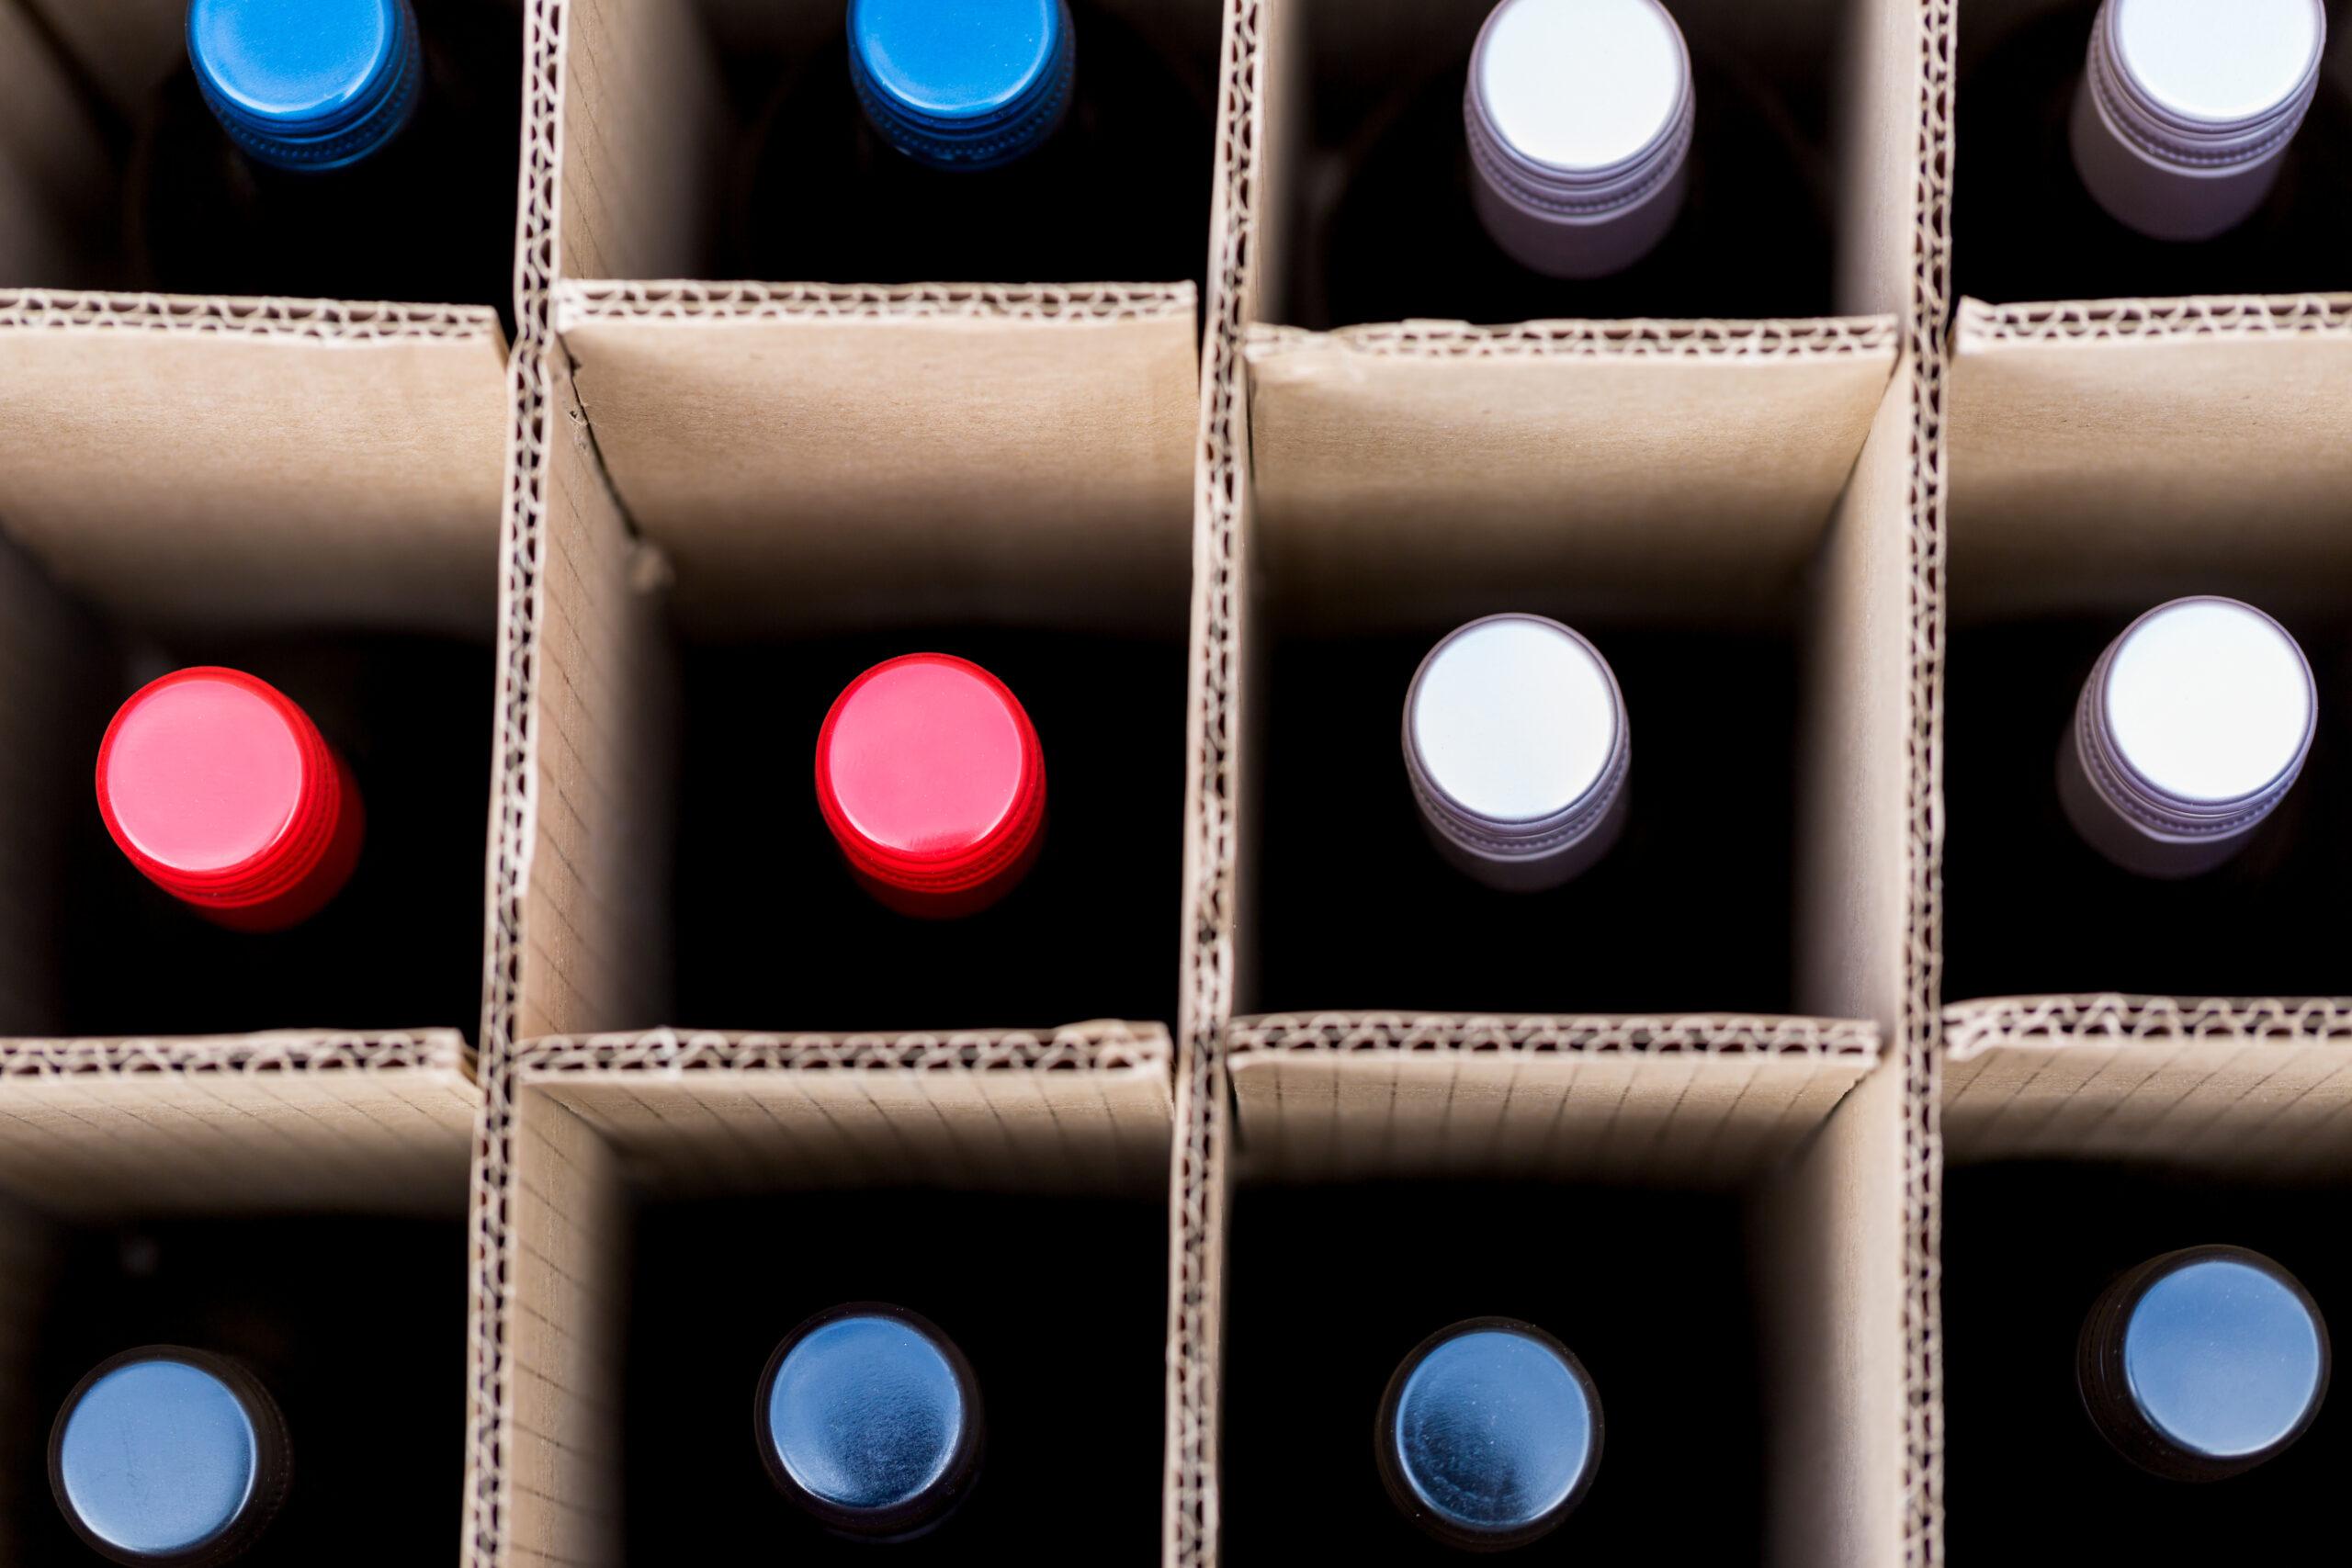 Vinography Unboxed: Week Of 12/13/20 : Vinography photo